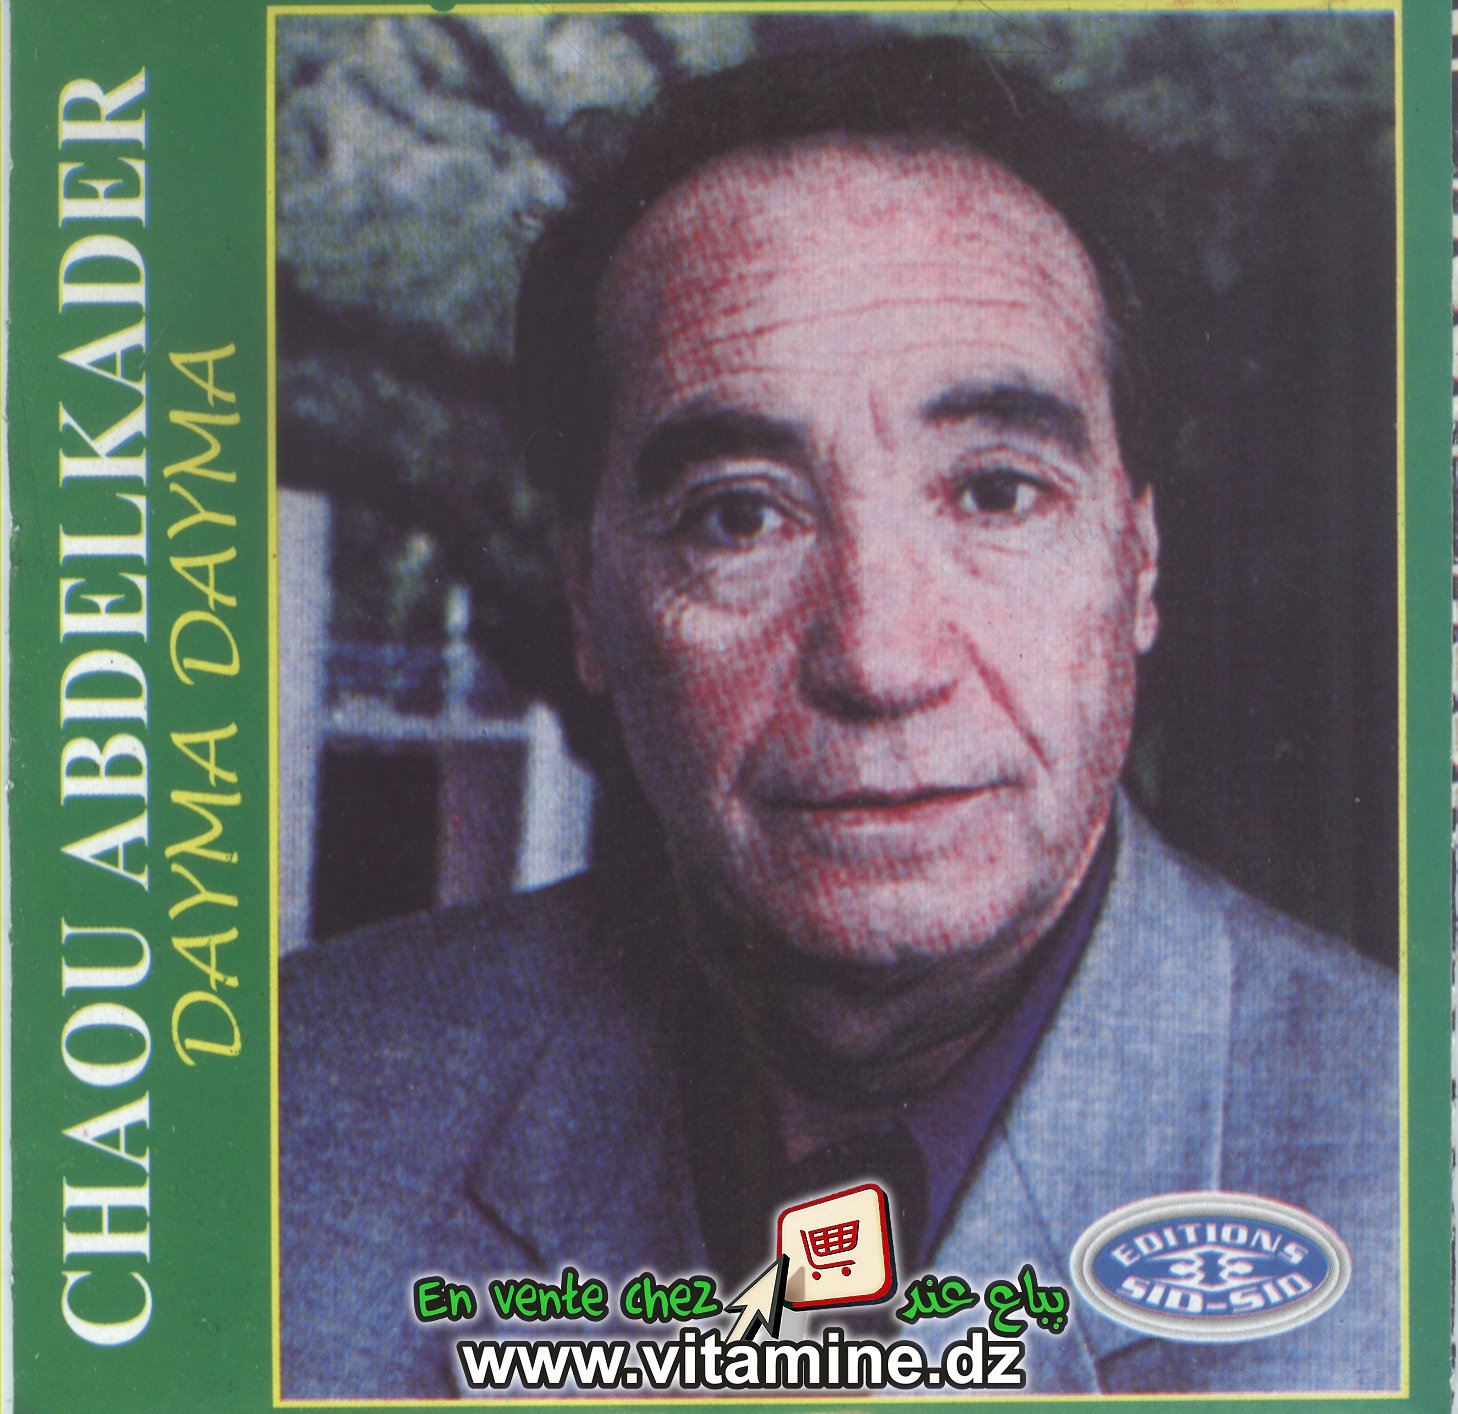 Chaou Abdelkader - dayma dayma